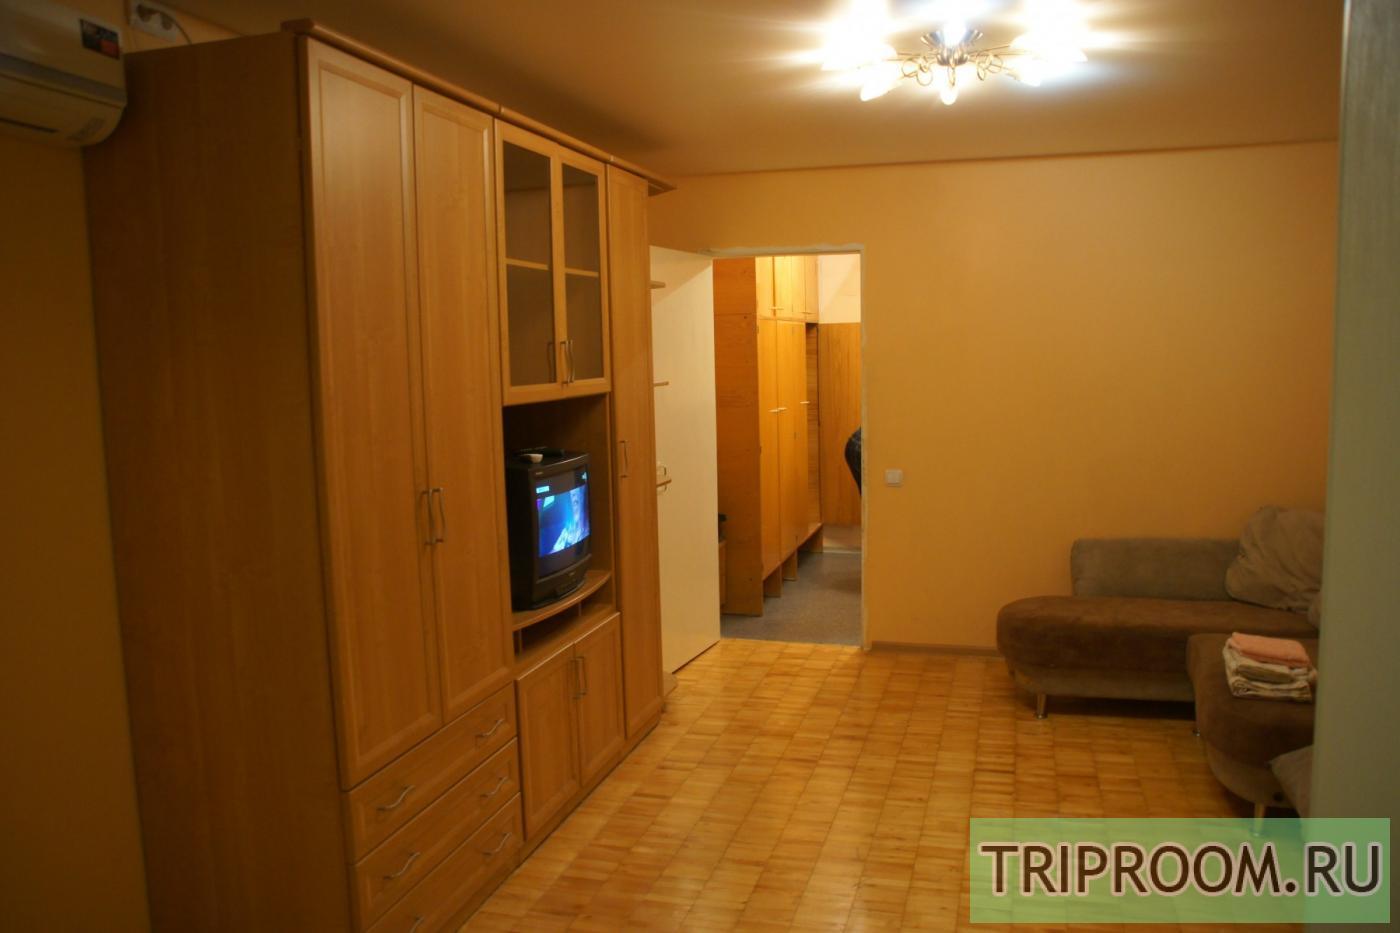 1-комнатная квартира посуточно (вариант № 30339), ул. Пархоменко улица, фото № 3